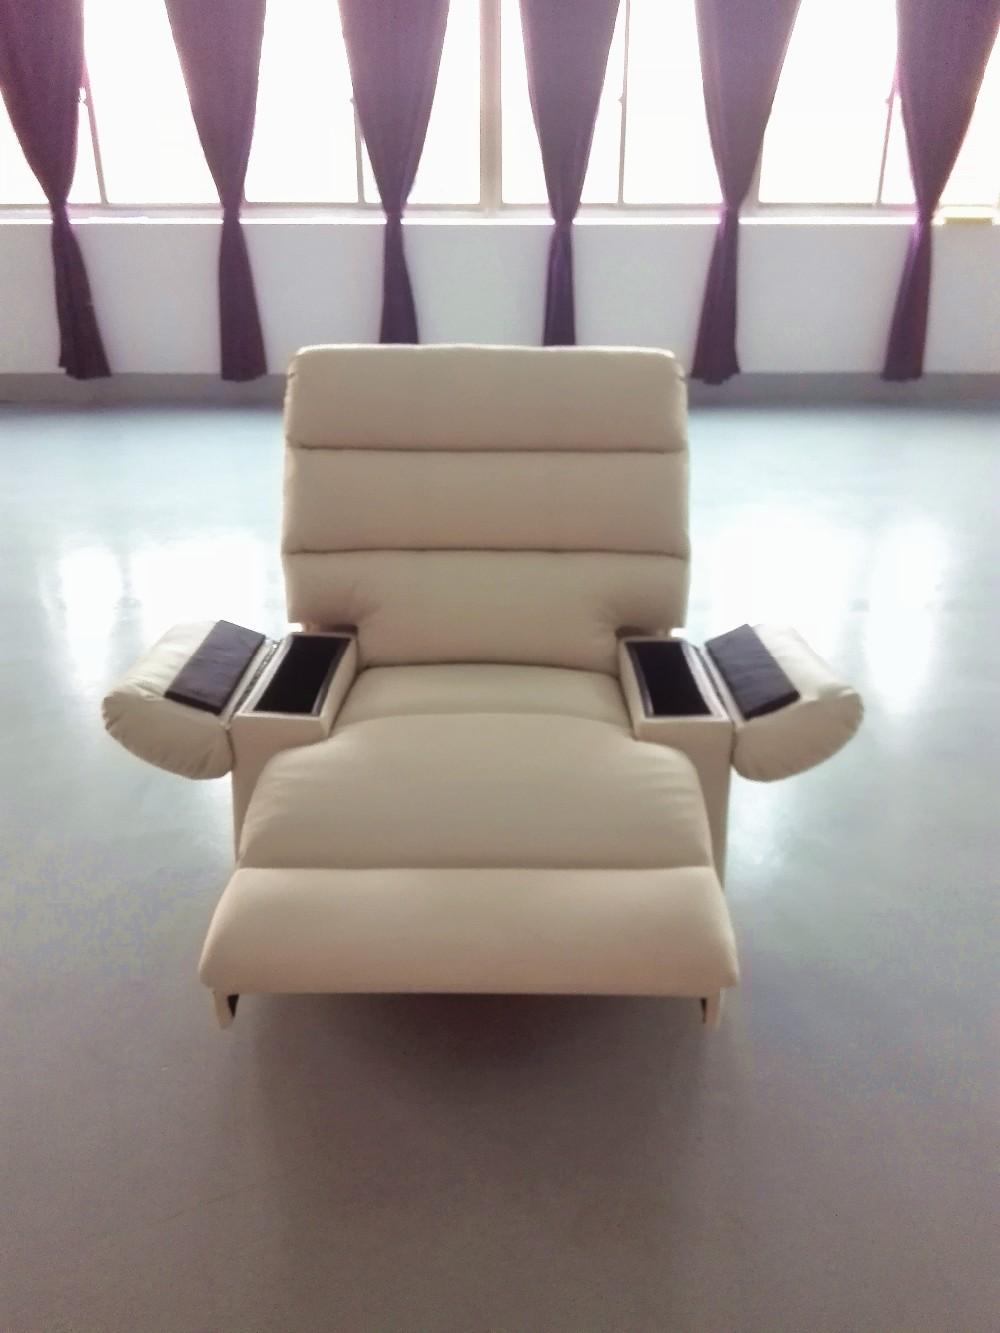 Designs Of Single Seater Sofa Designs Of Single Seater Sofa